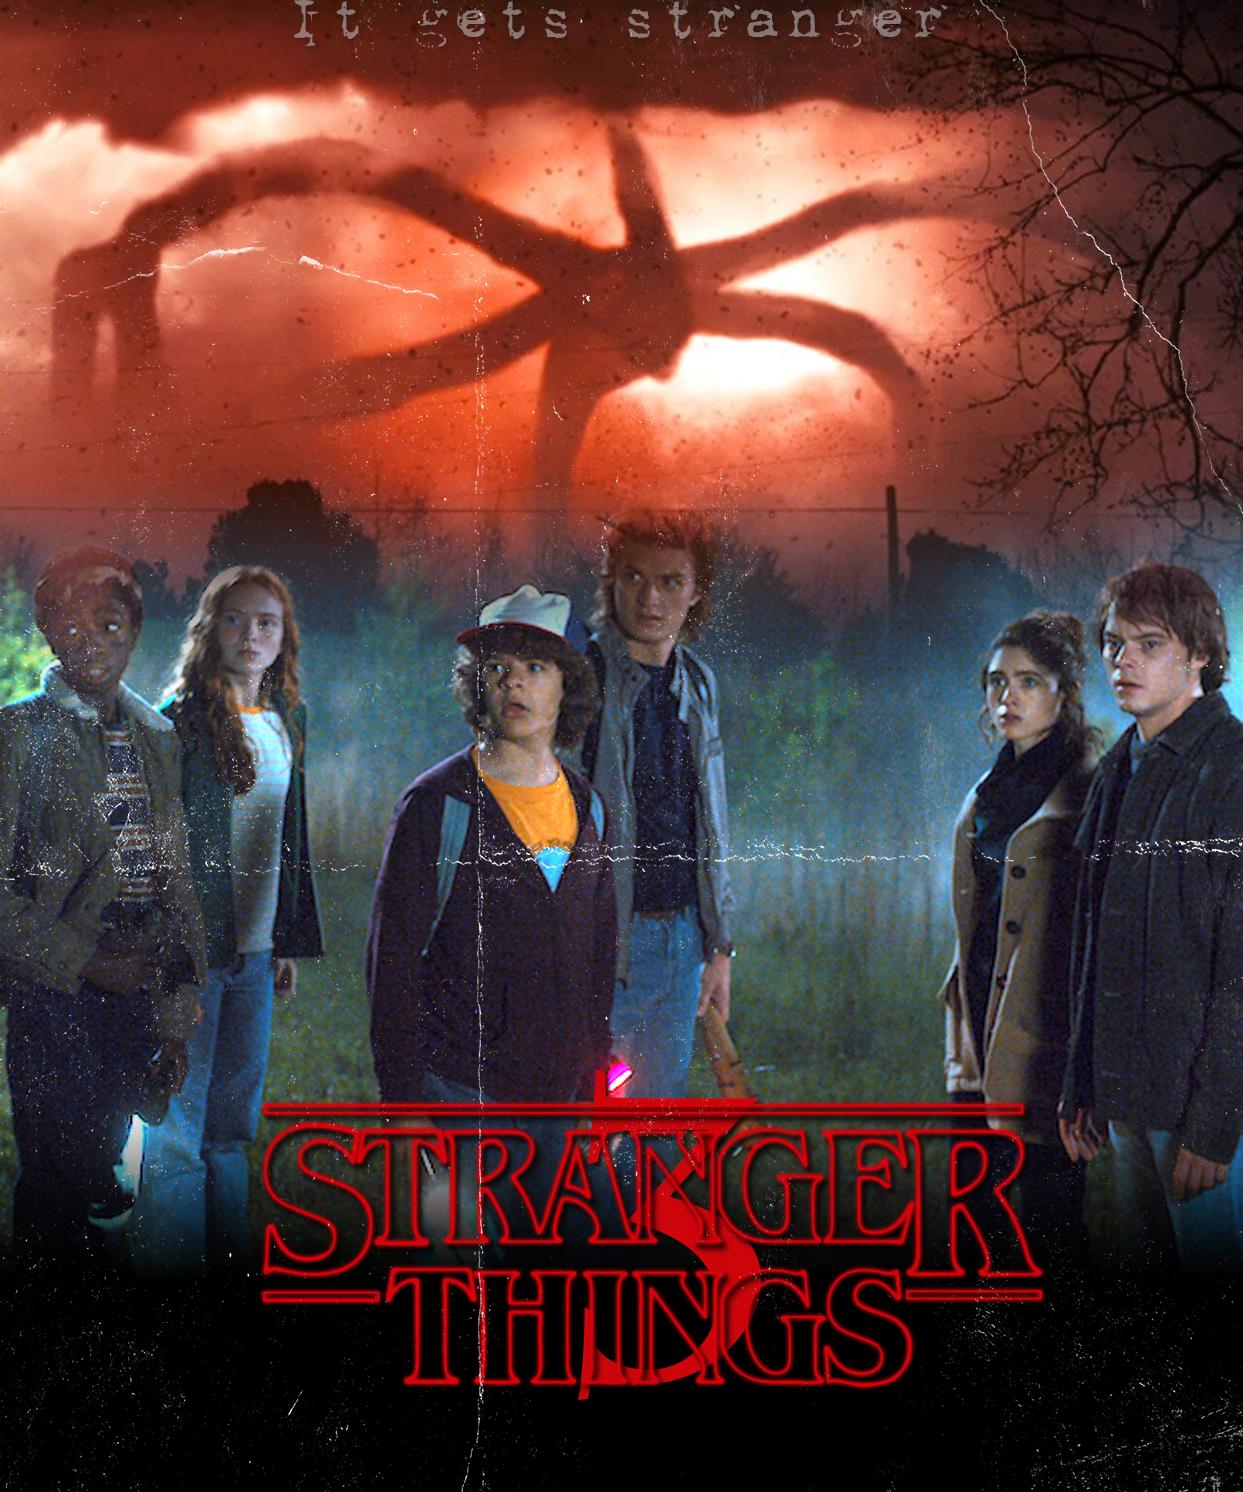 Stranger Things Season 3 Hd Wallpapers Wallpaper Cave